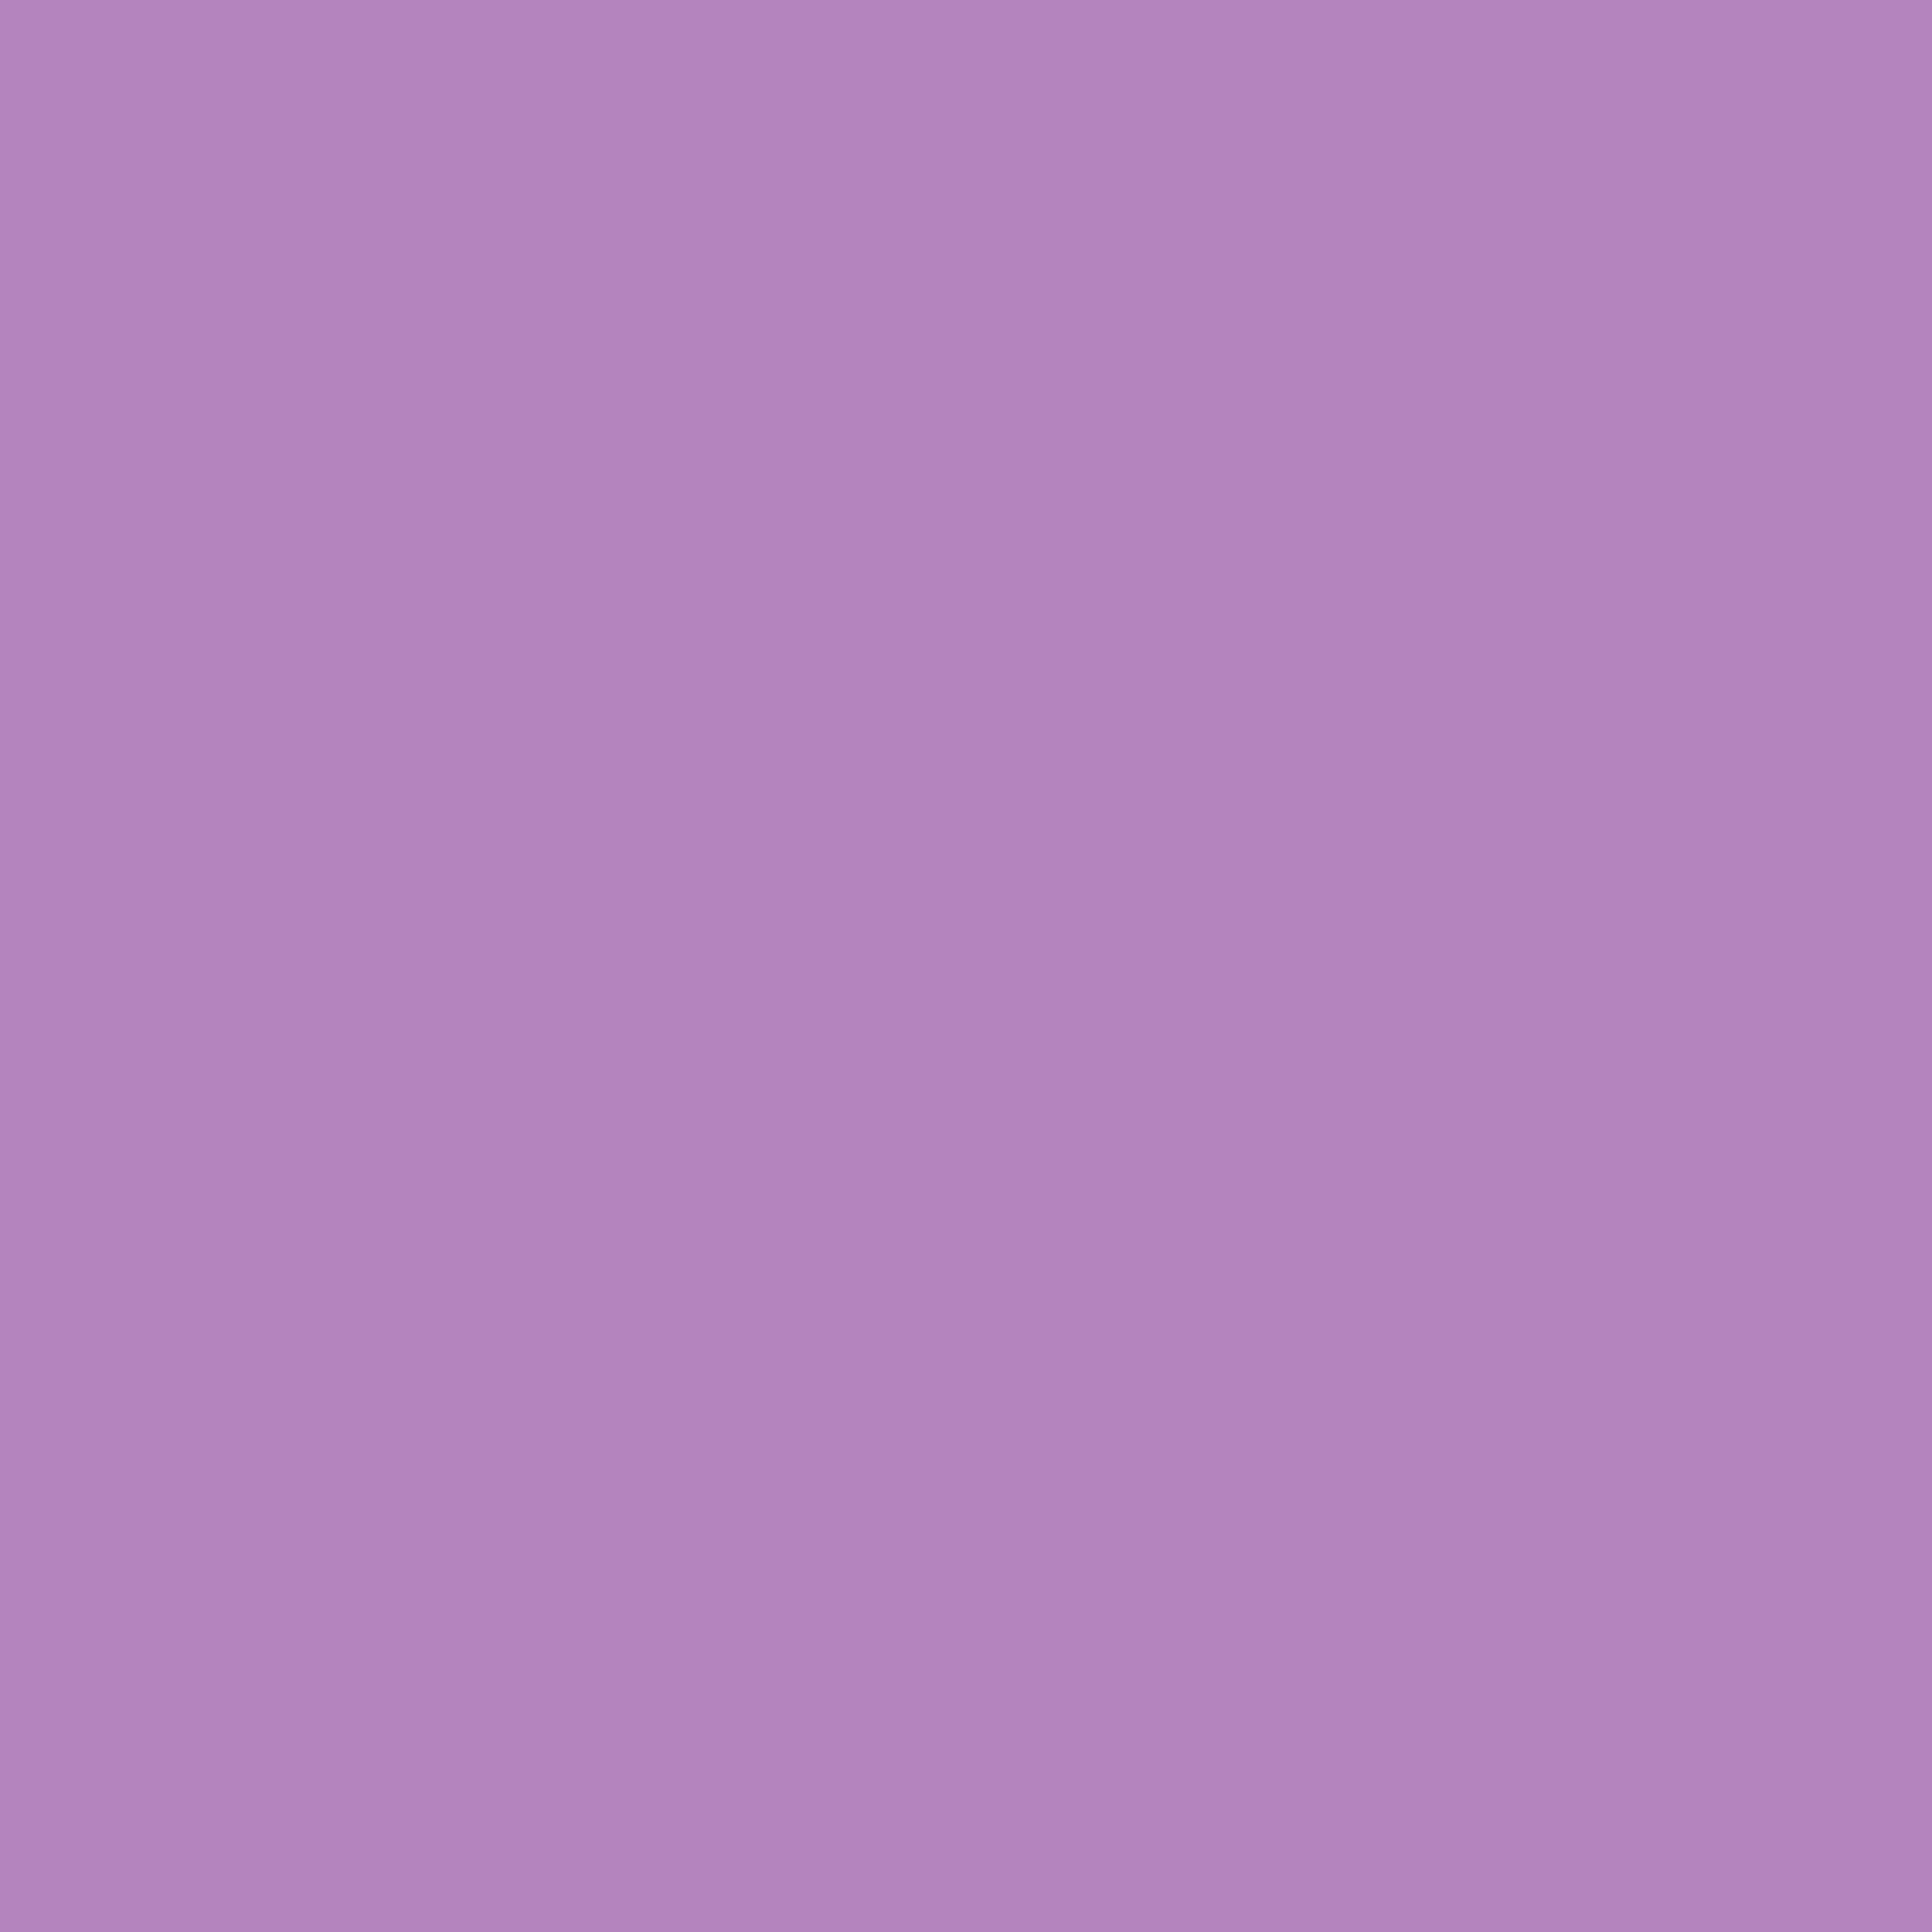 3600x3600 African Violet Solid Color Background